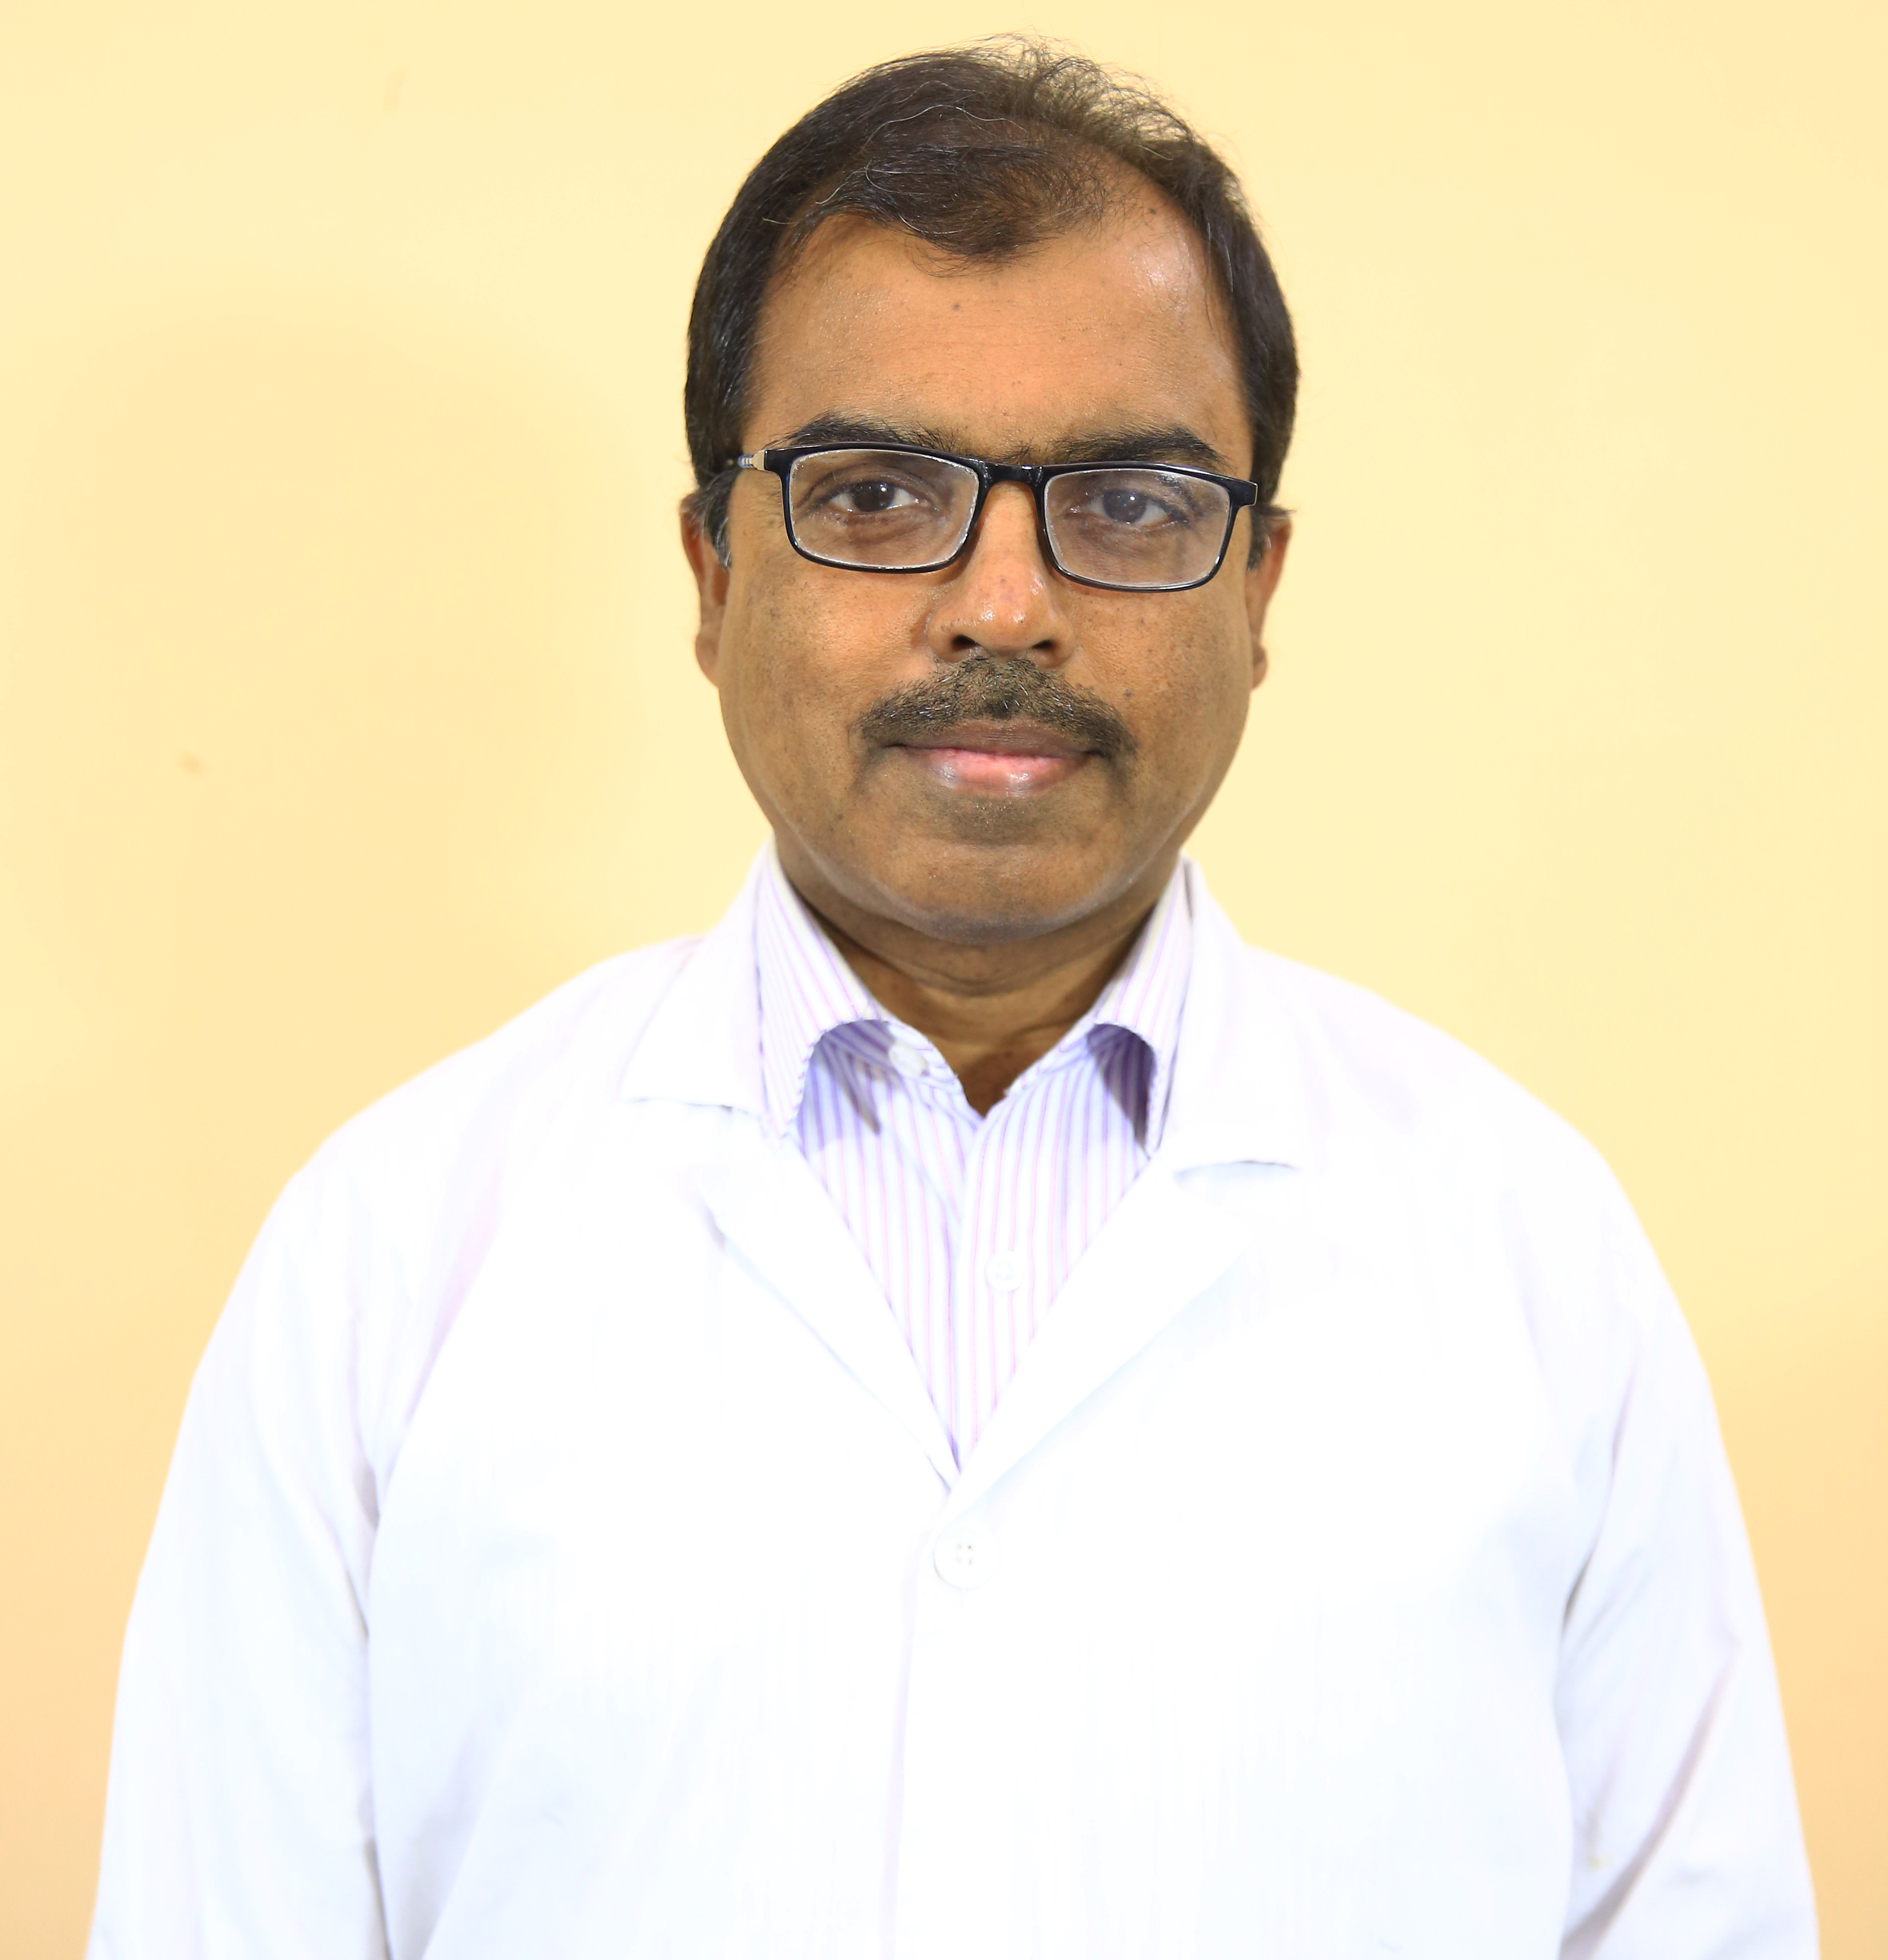 Dr. Md. Rafiqul Islam